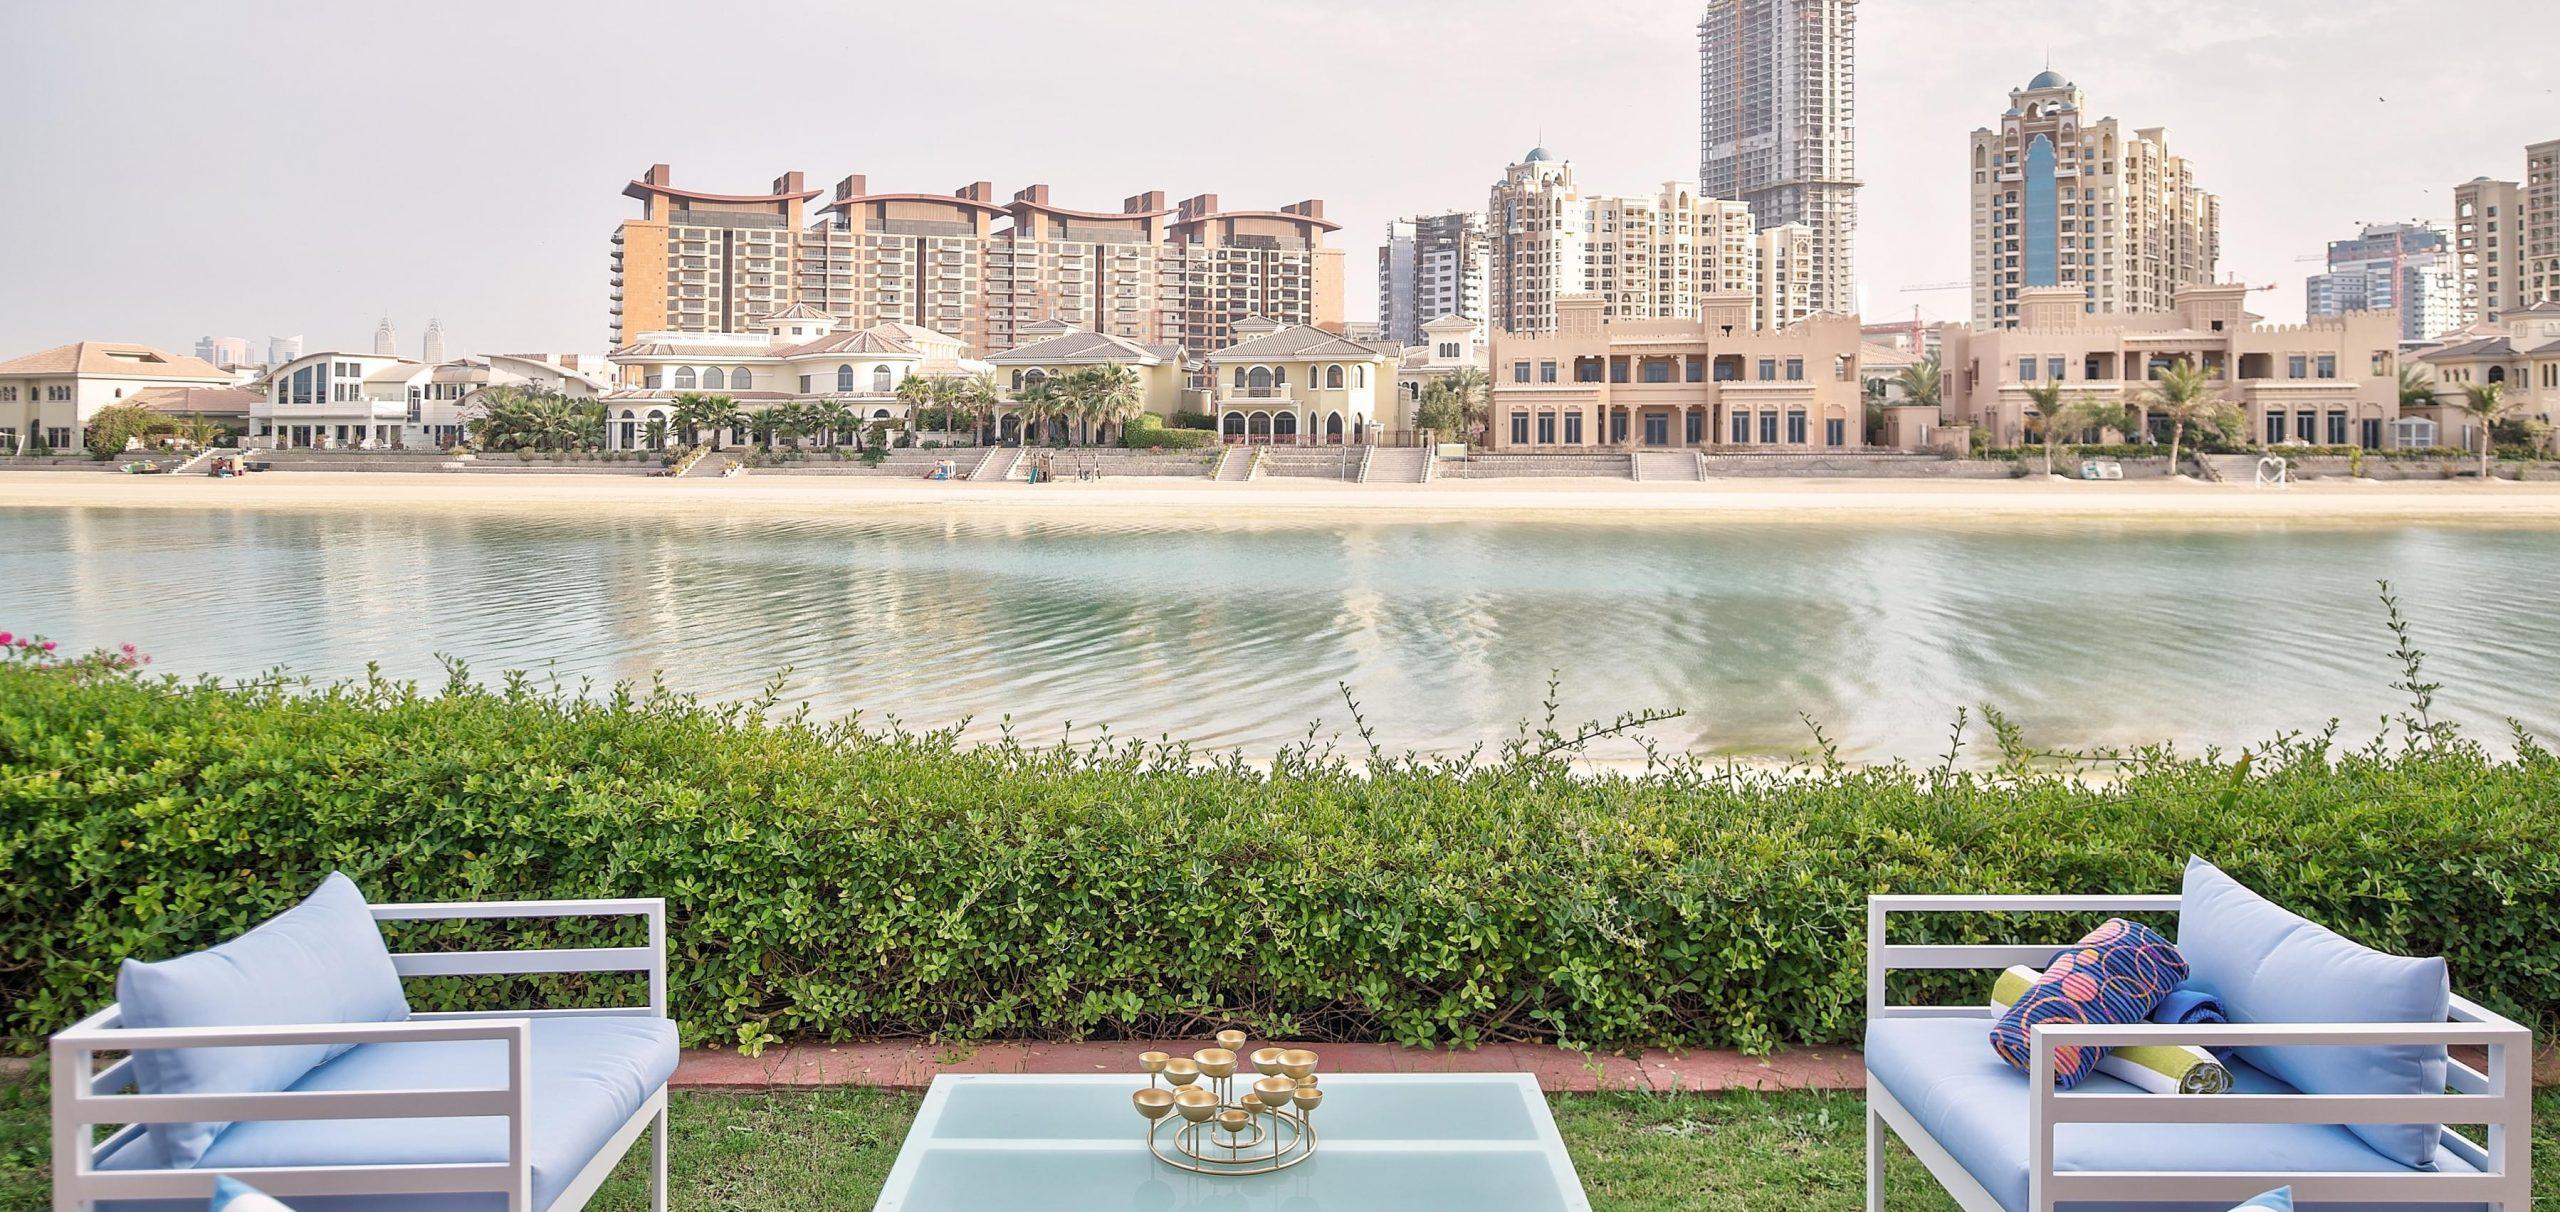 Find Vacation Villas, Holiday Homes & Hotels in Dubai